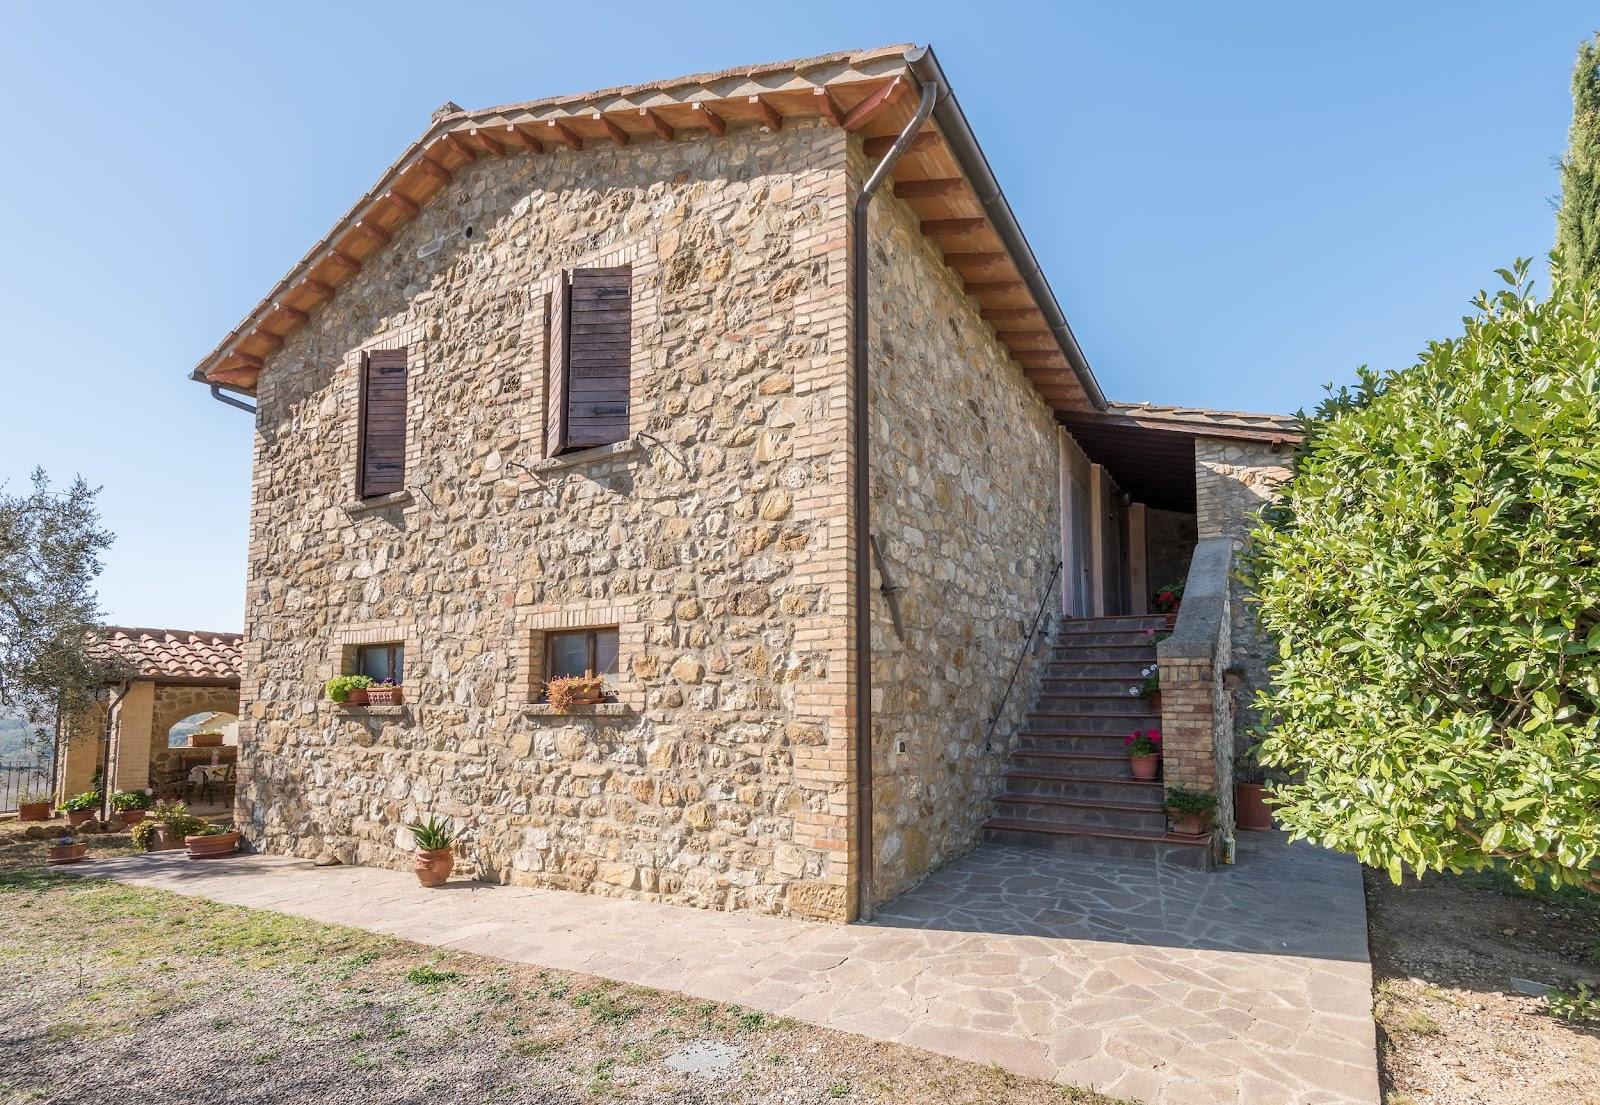 Casale Montenero_Castel del Piano_2